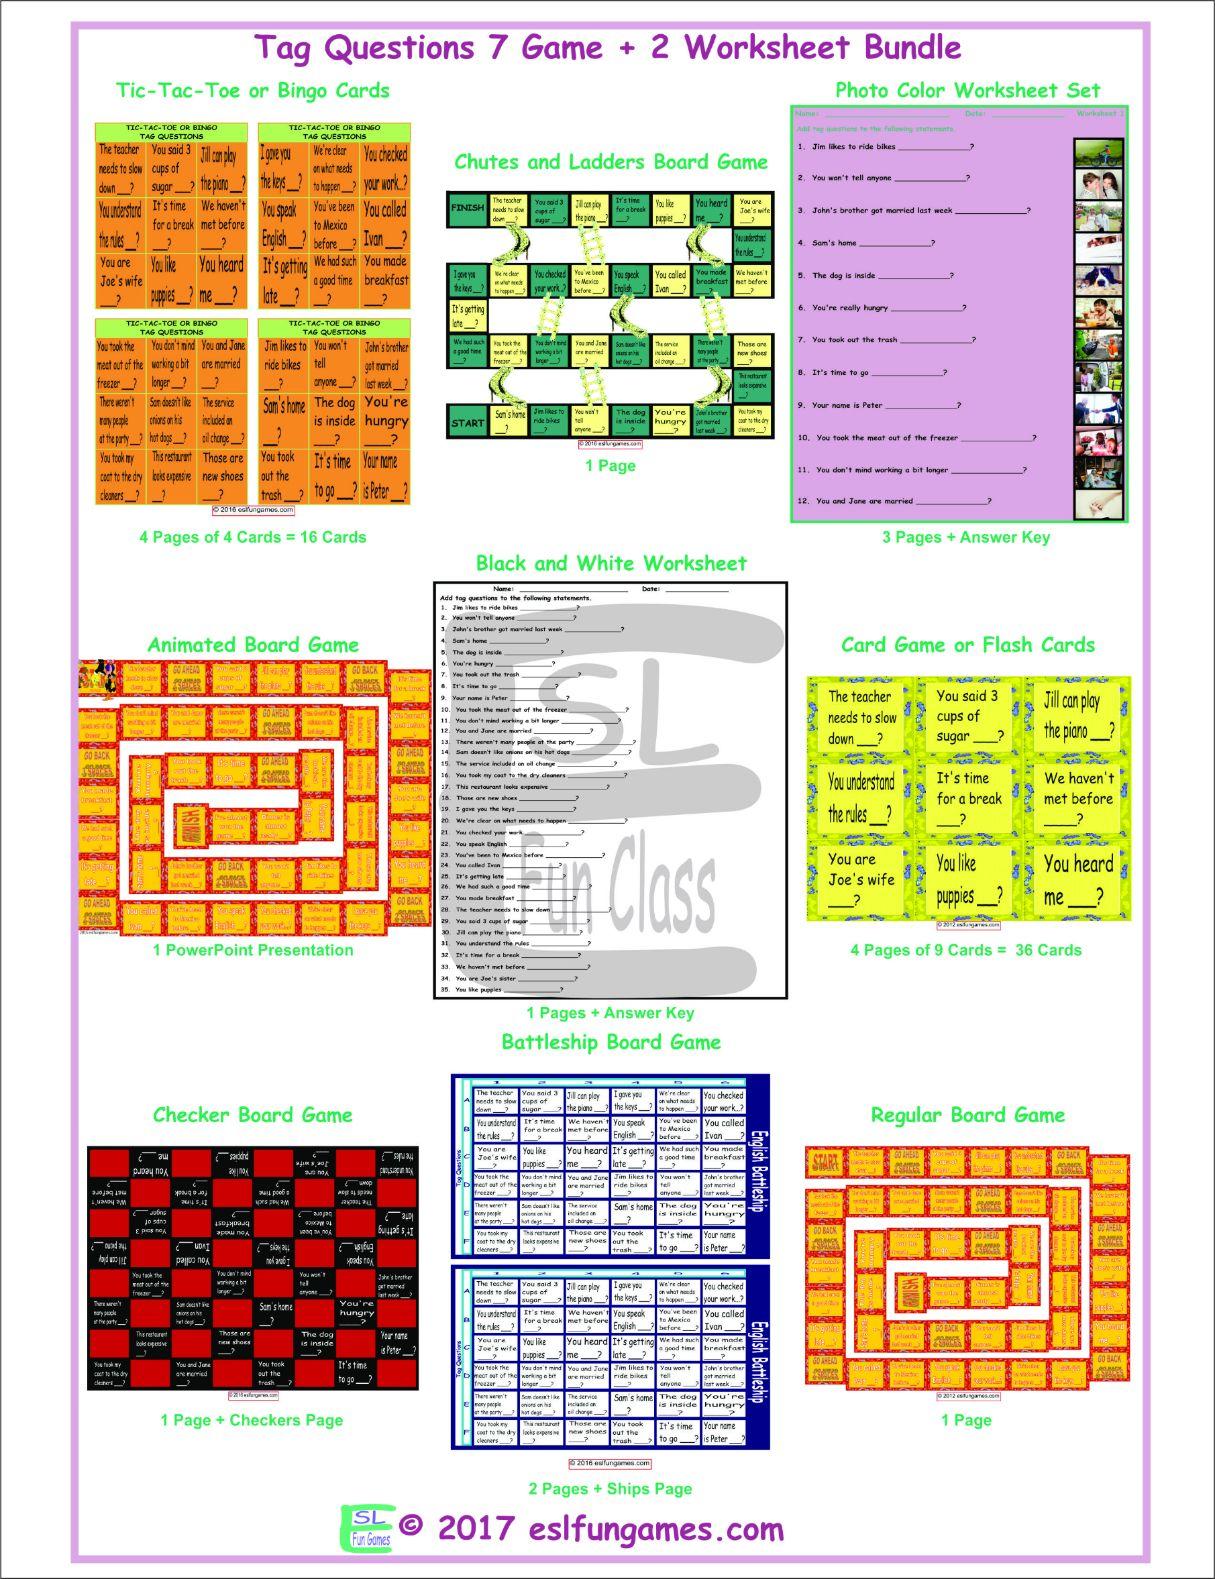 Tag Questions 7 Game Plus 2 Worksheet Bundle